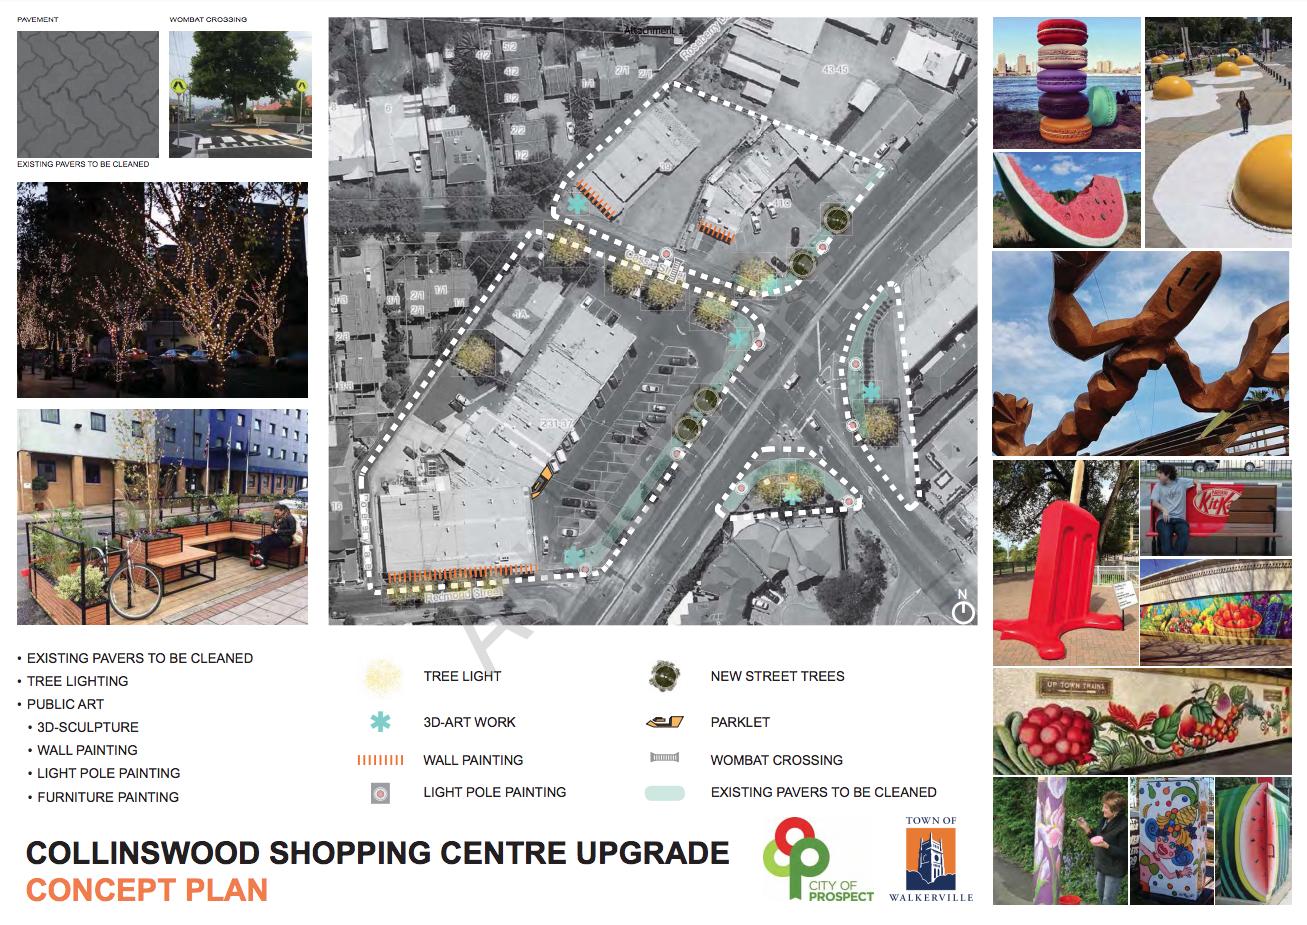 Collinswood Chopping Centre Precinct Upgrade Concept Plan